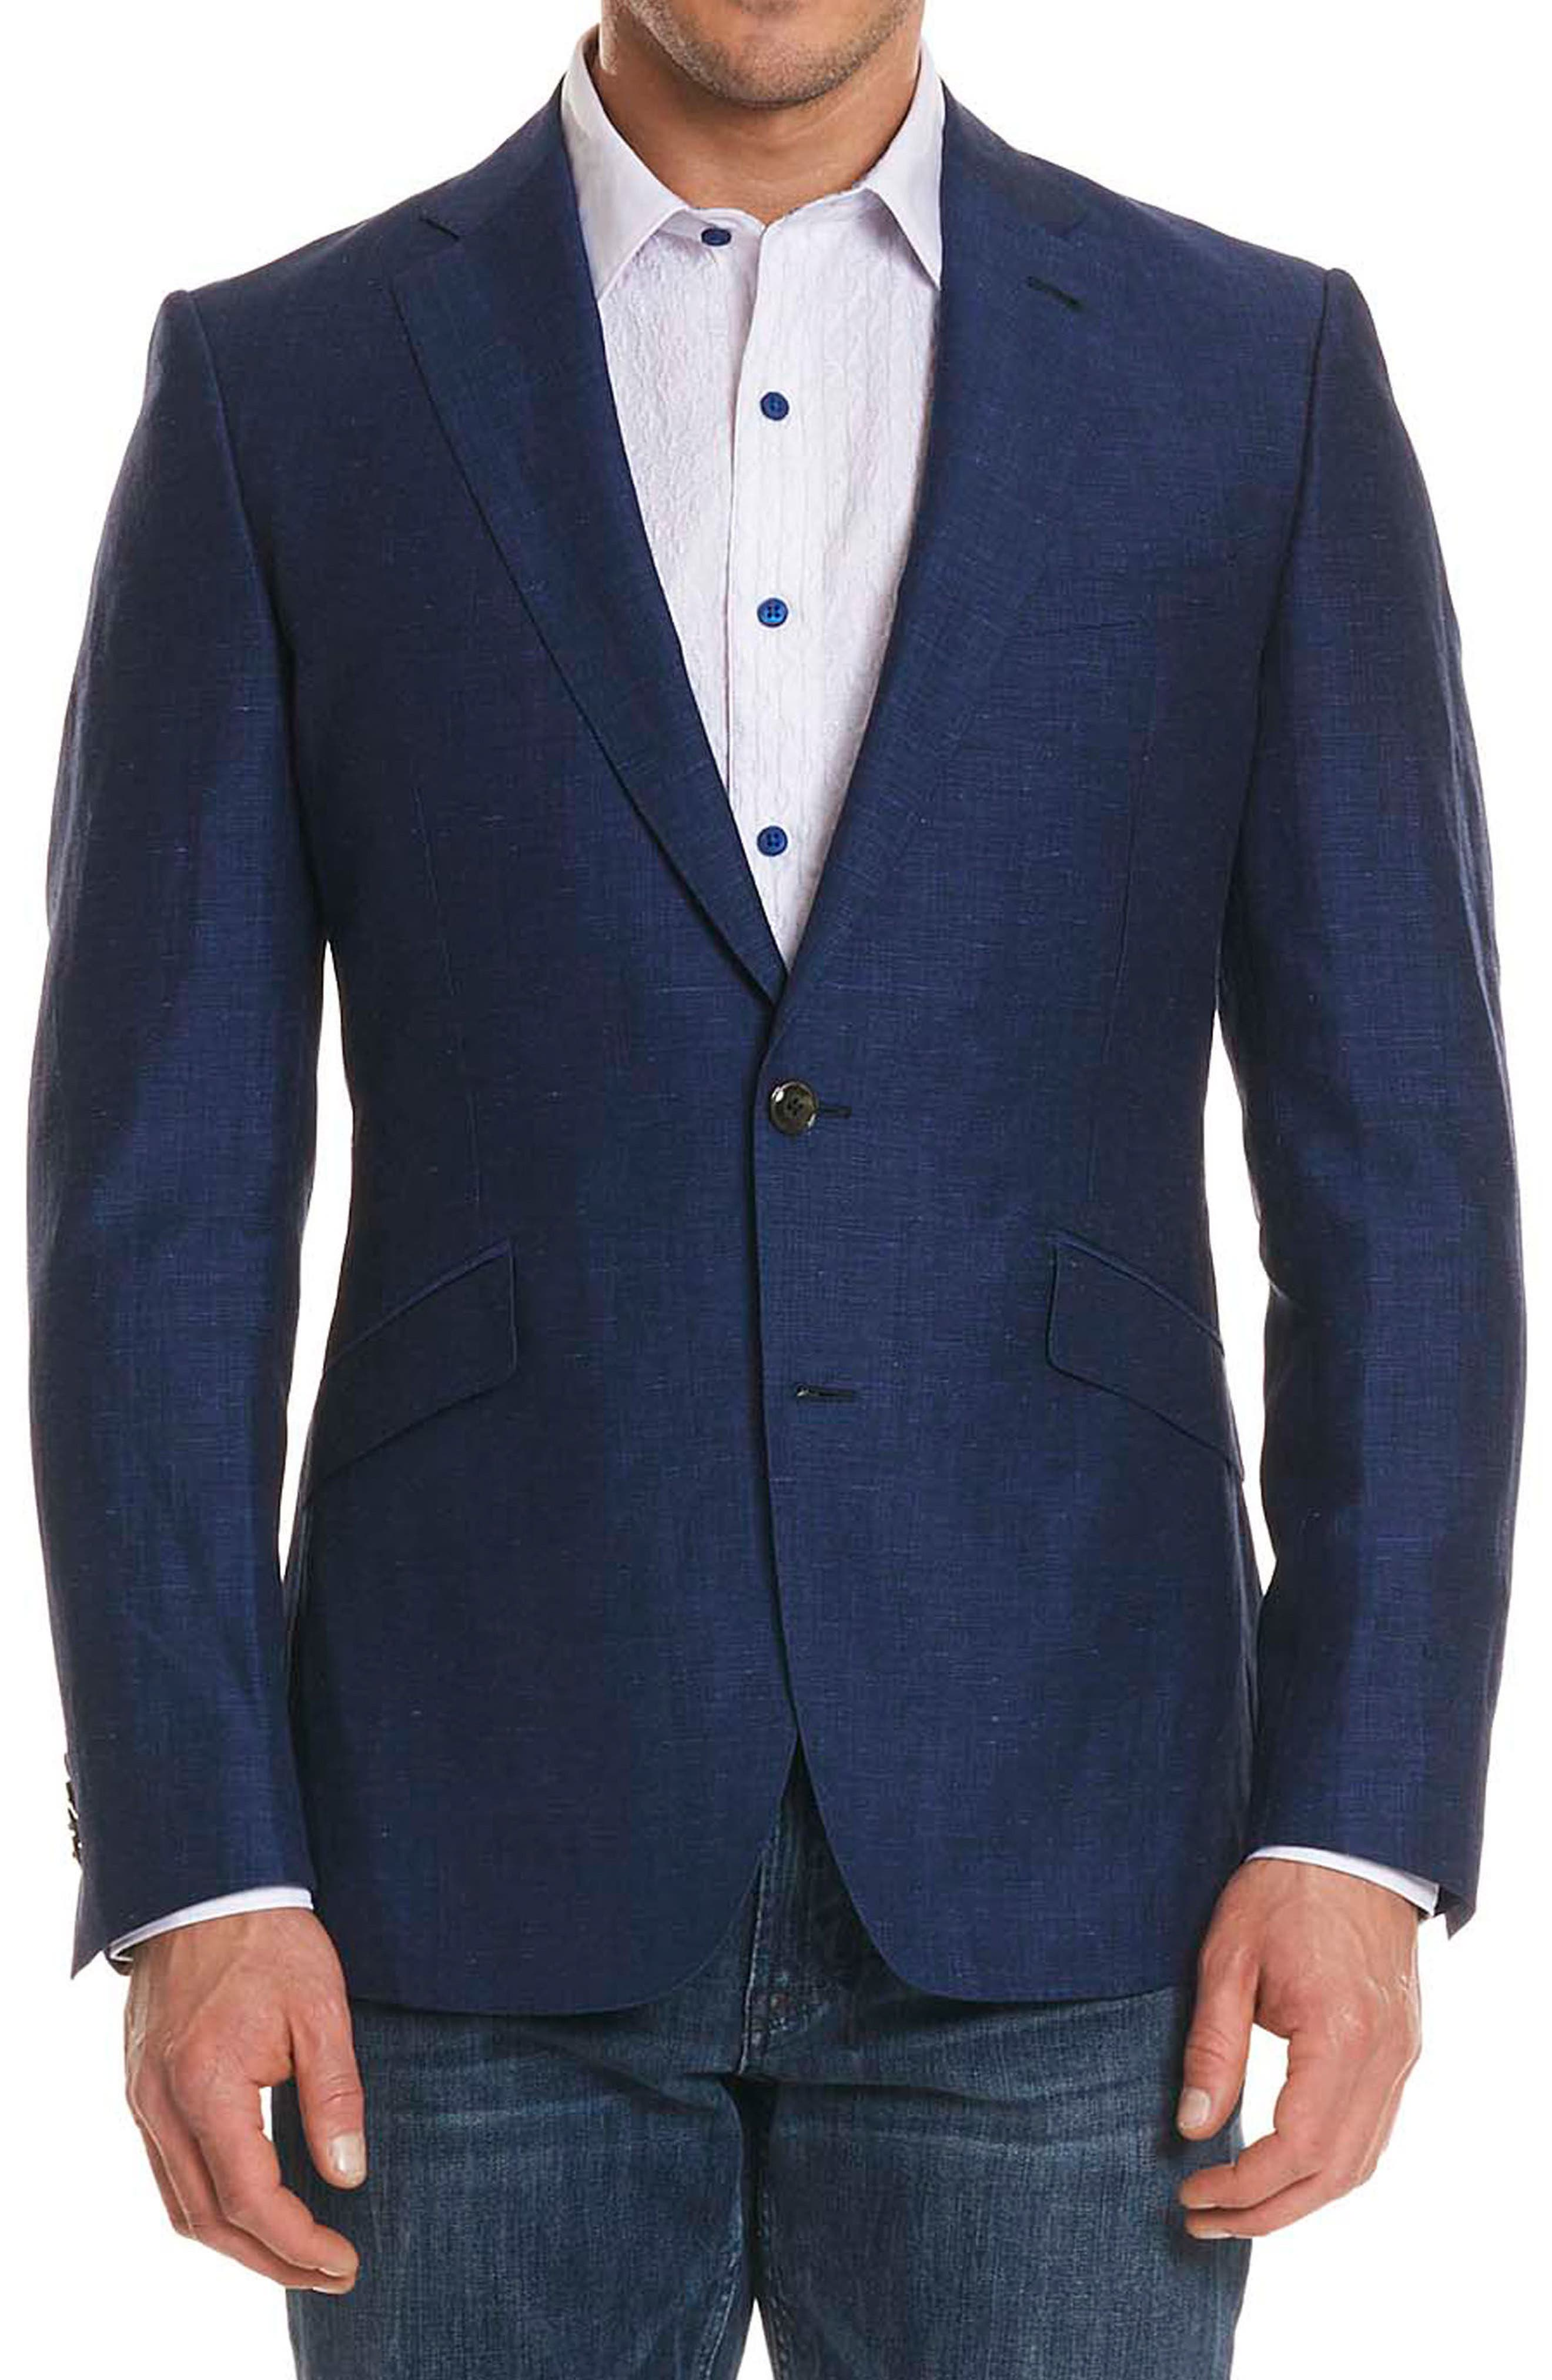 Alternate Image 1 Selected - Robert Graham Vidin Tailored Fit Linen & Wool Sportcoat